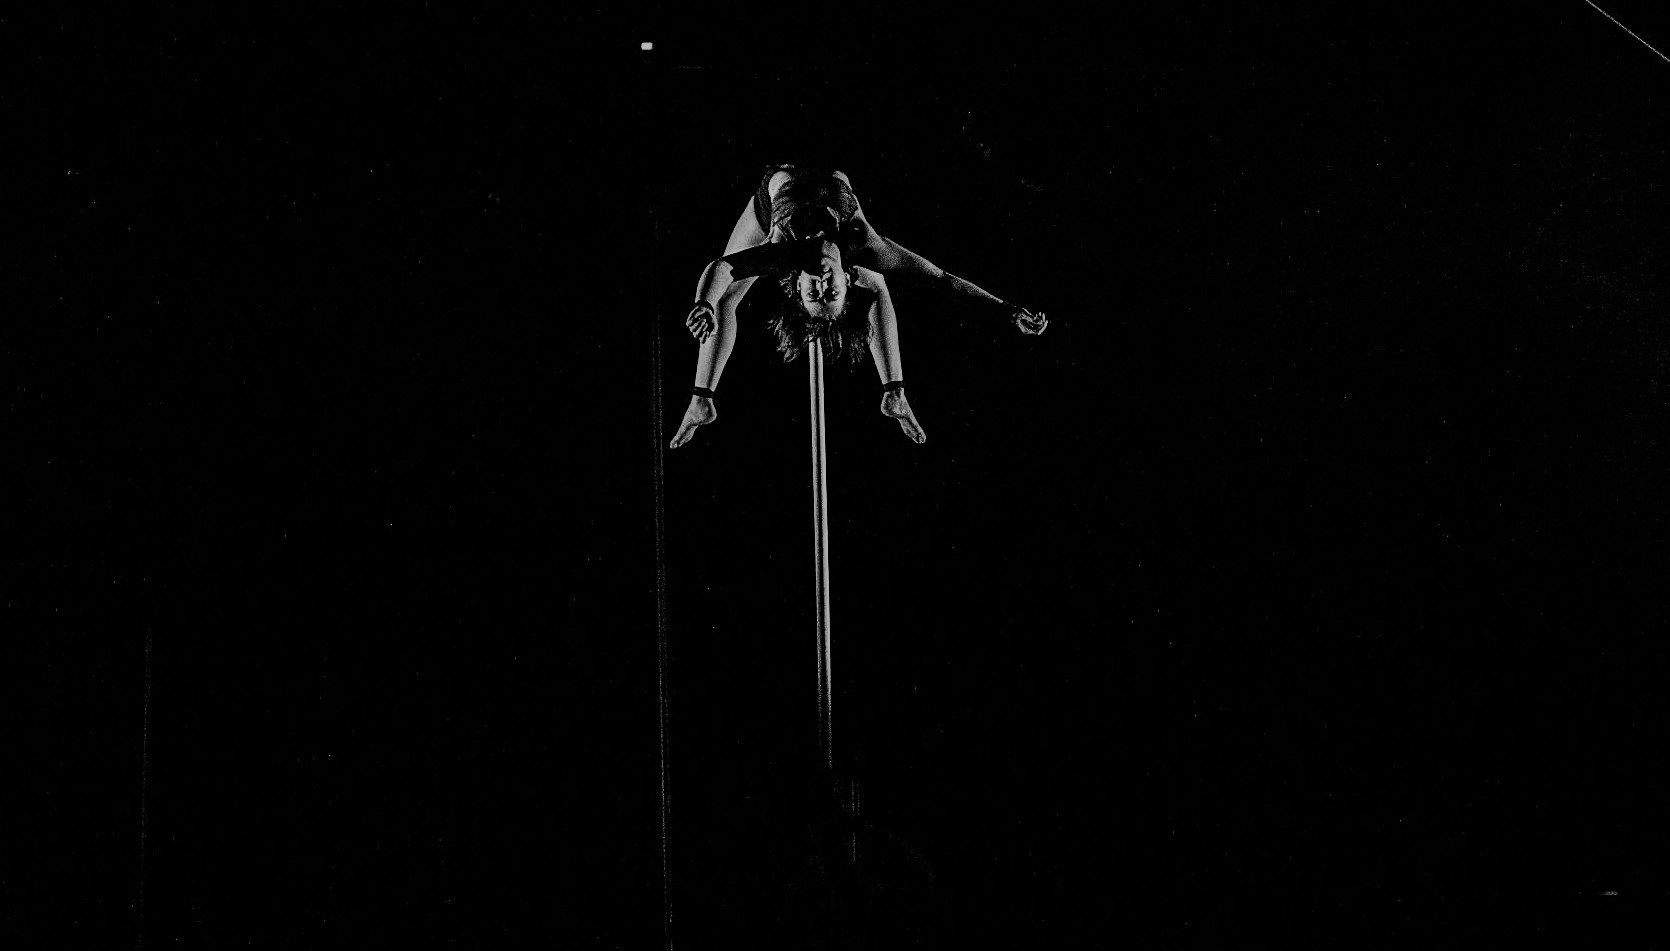 Festival Internacional de Circo invade os Sescs de SP